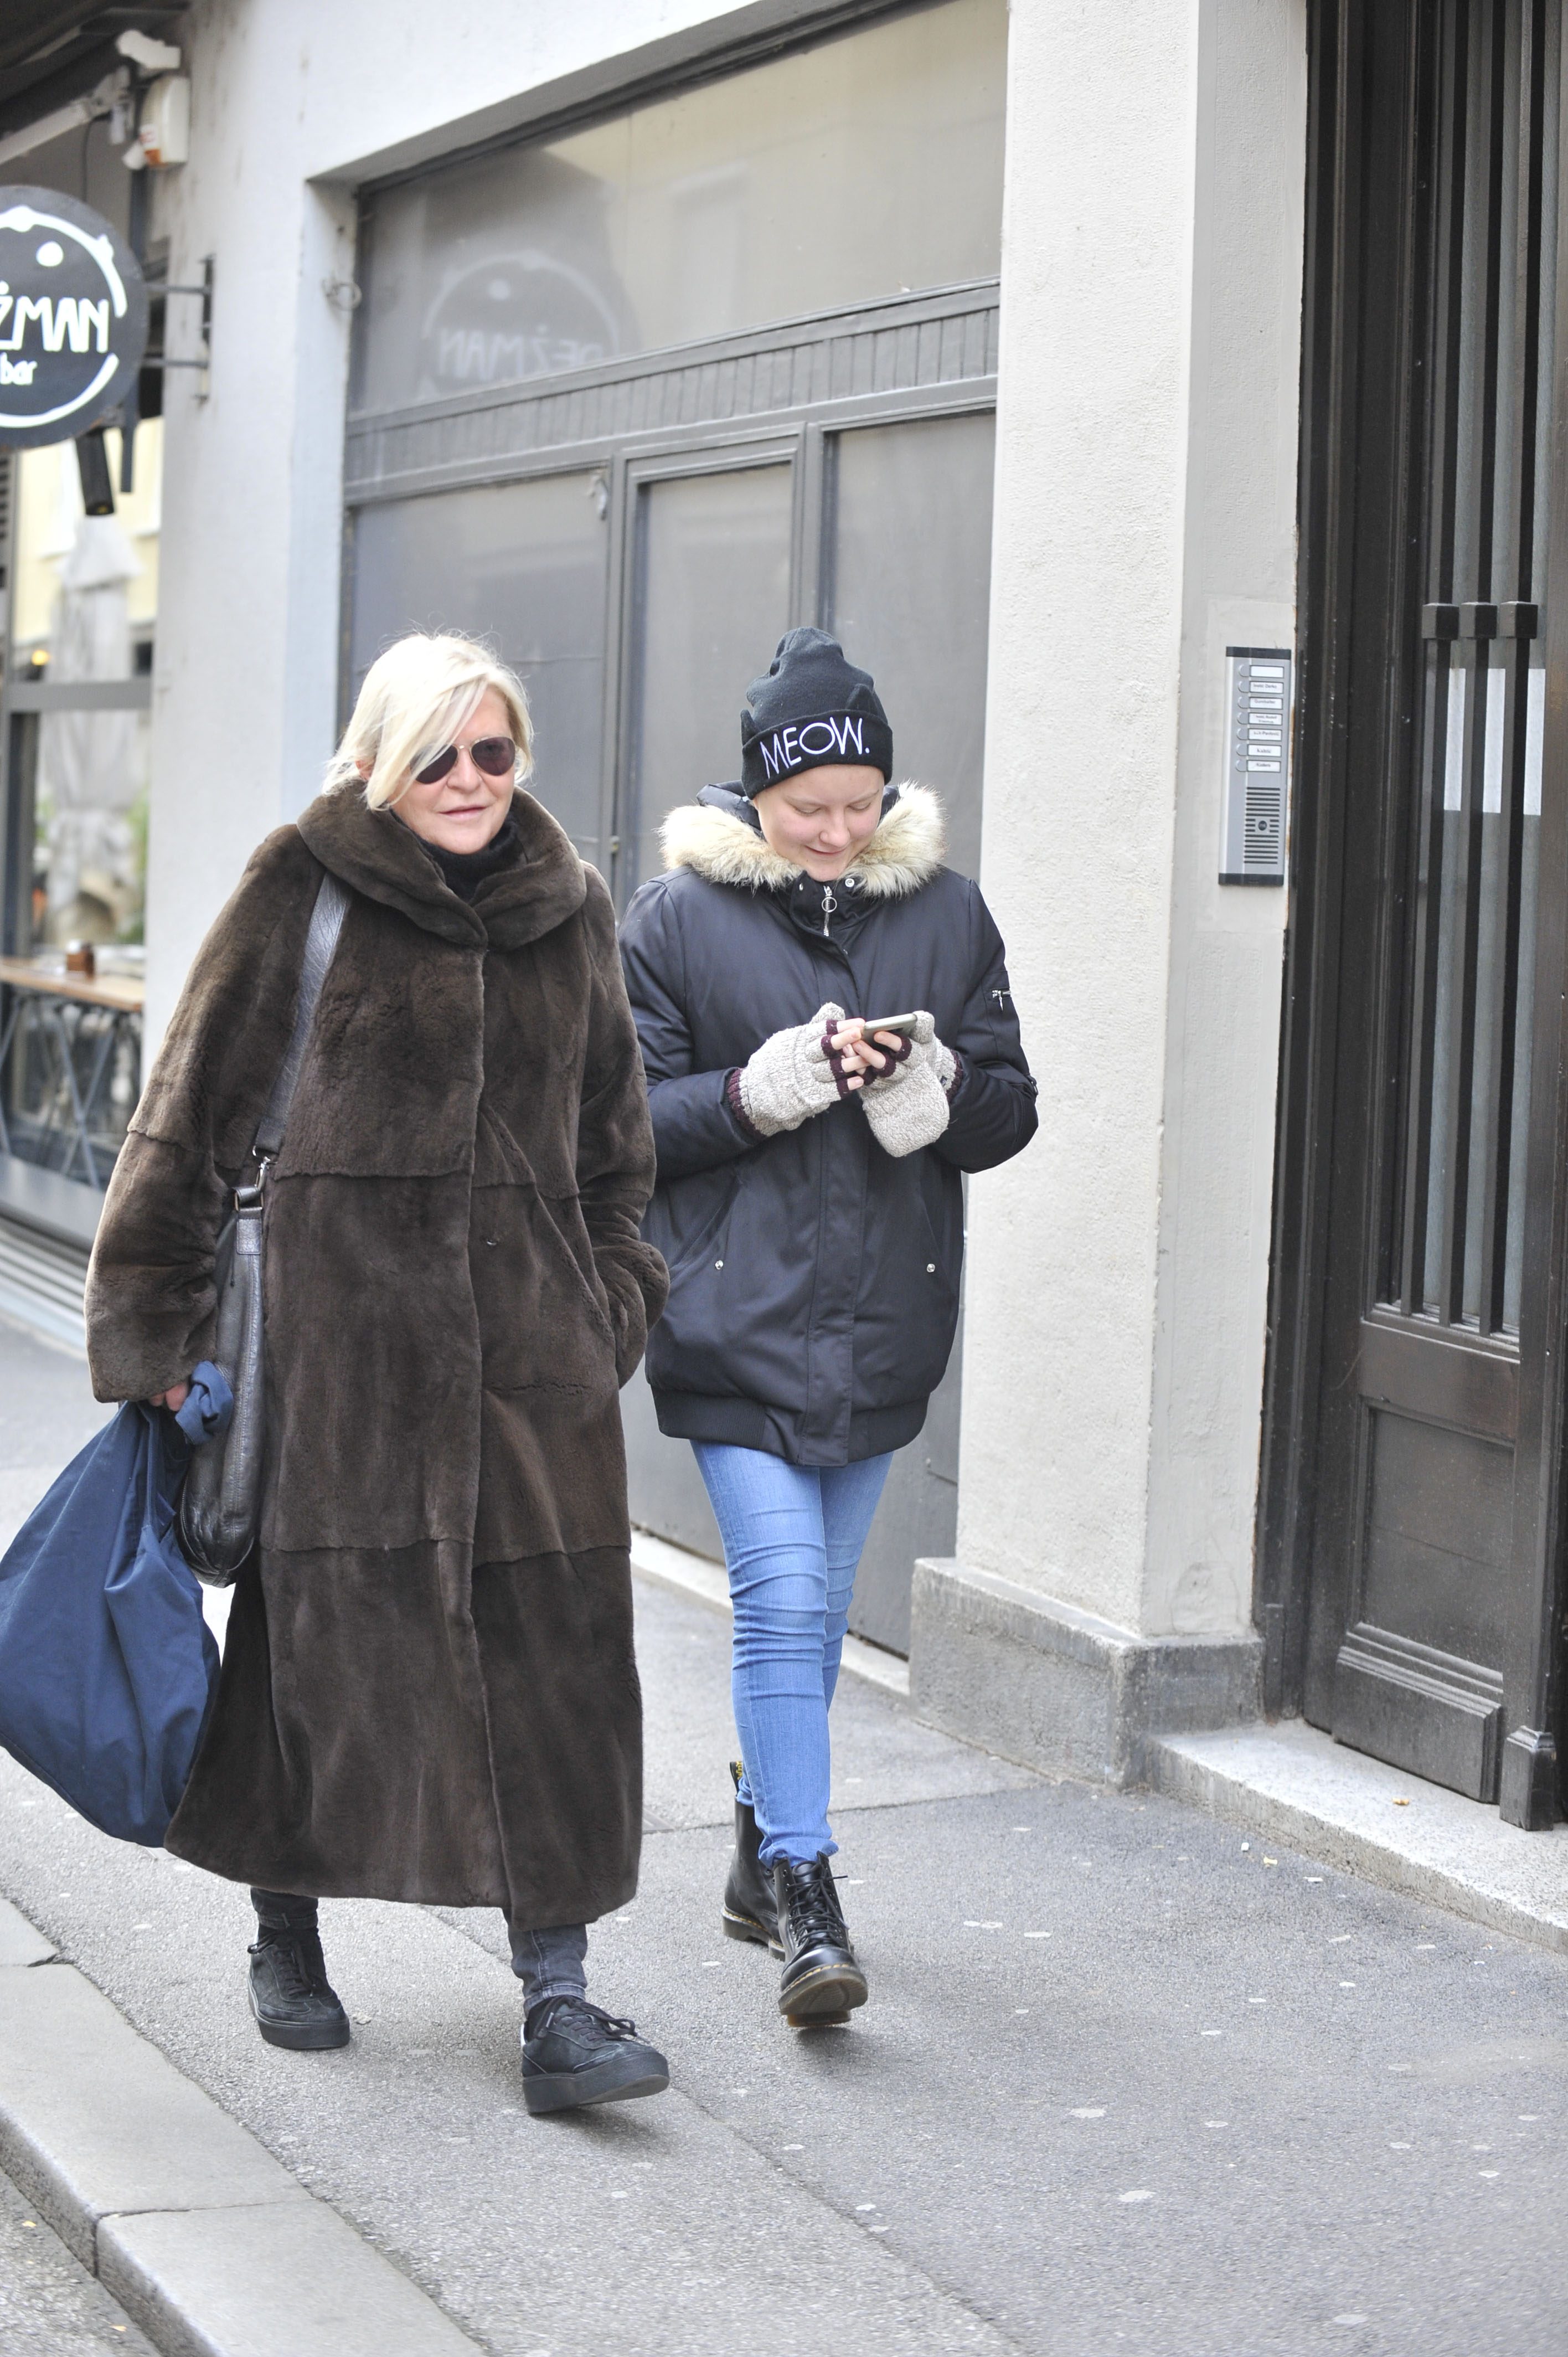 Spica / Zagreb 02.2017. / foto: Maja Jurovic / Zeljka Ogresta i kcer Marta